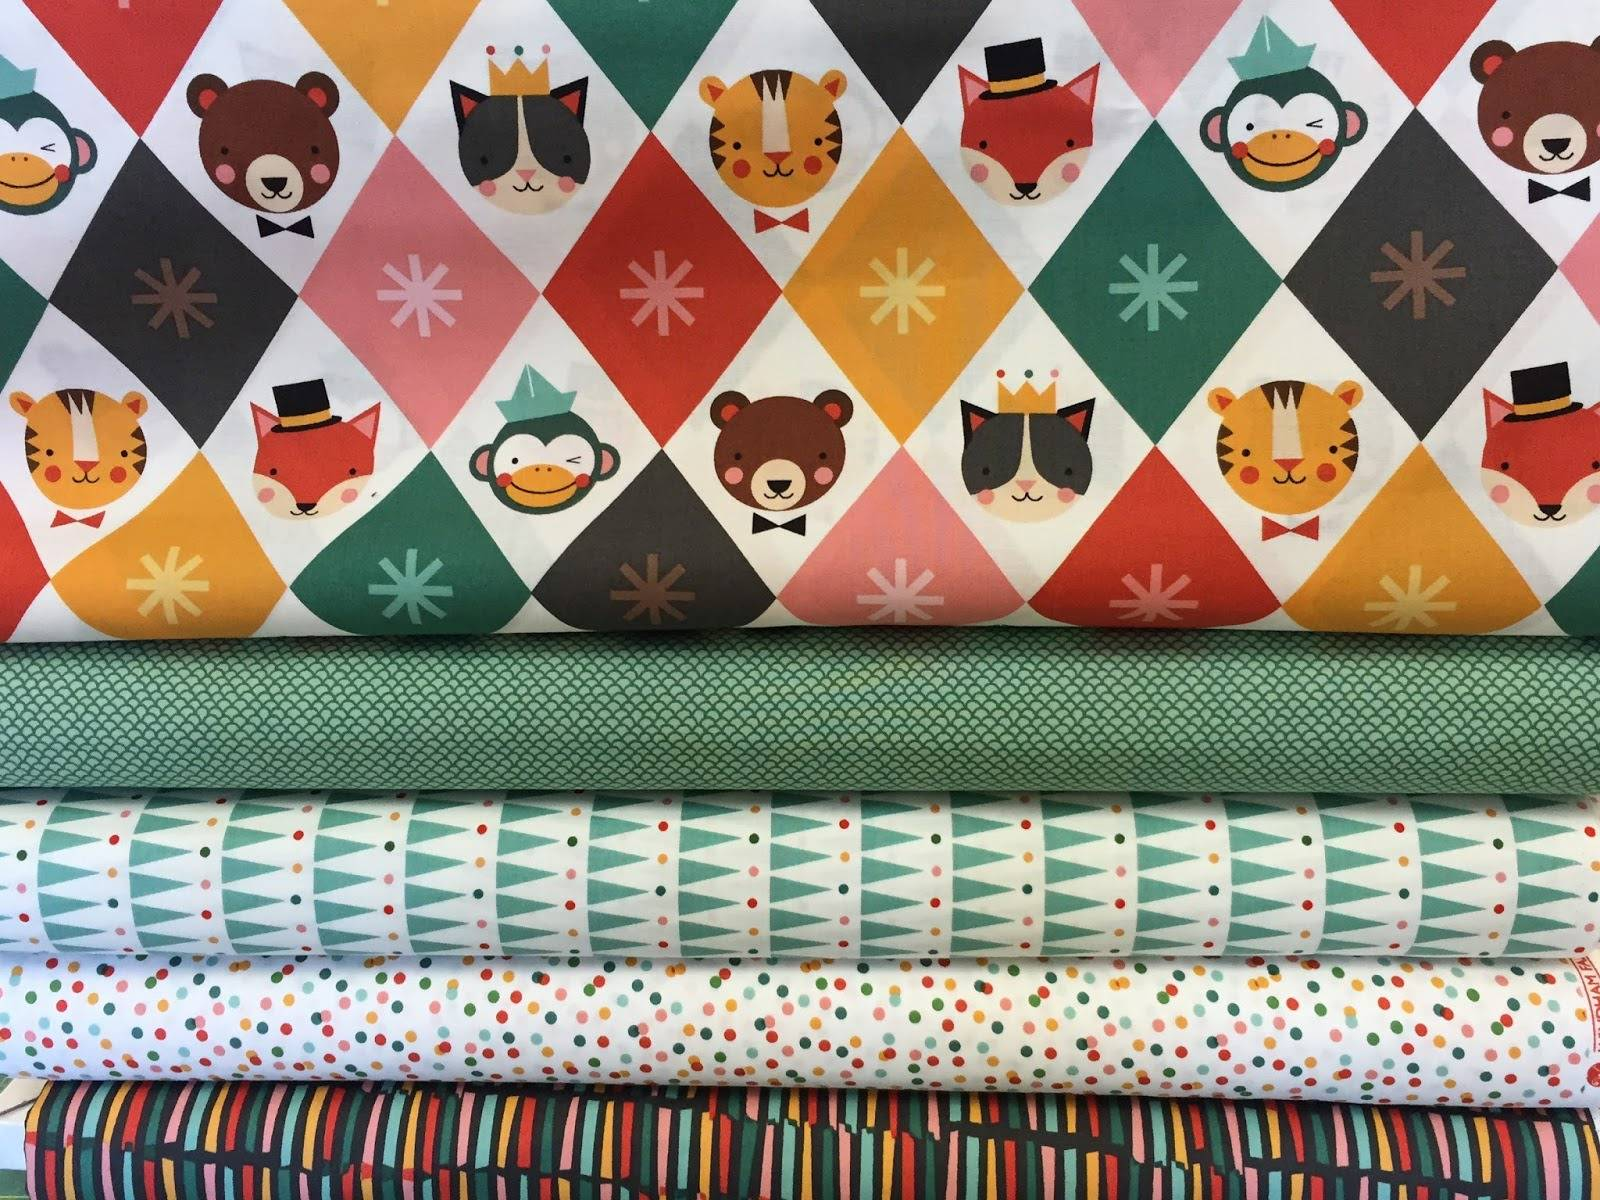 tissu enfant patchwork multicolore,  Party Animals, Whindam fabrics